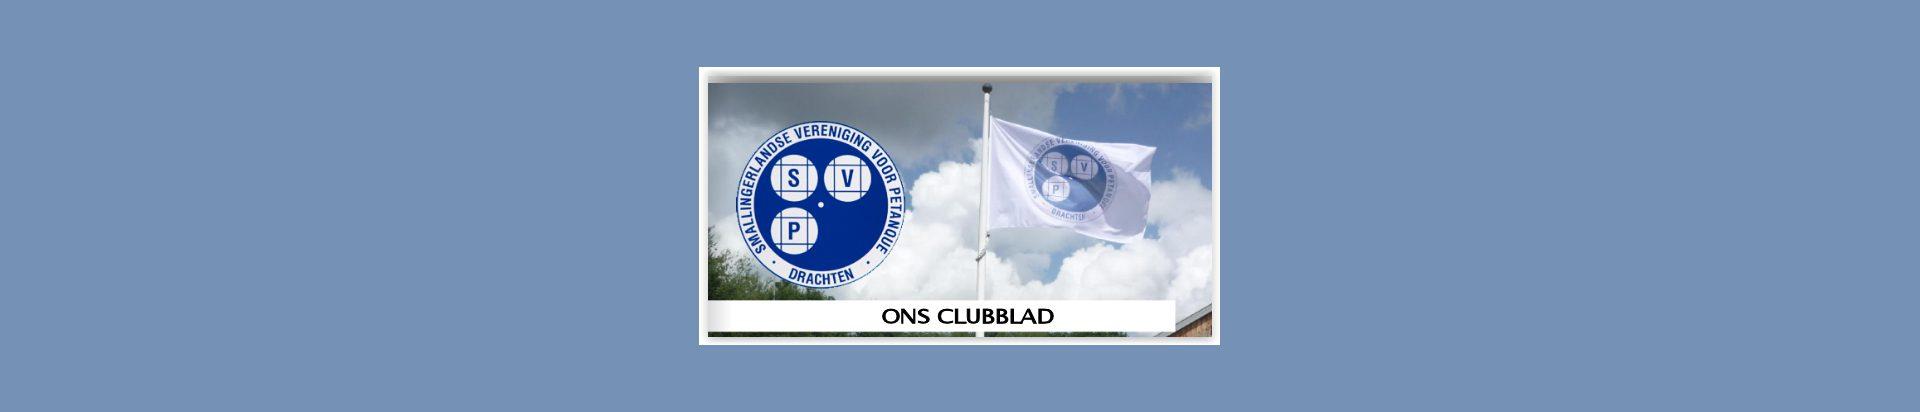 SVP Clubblad